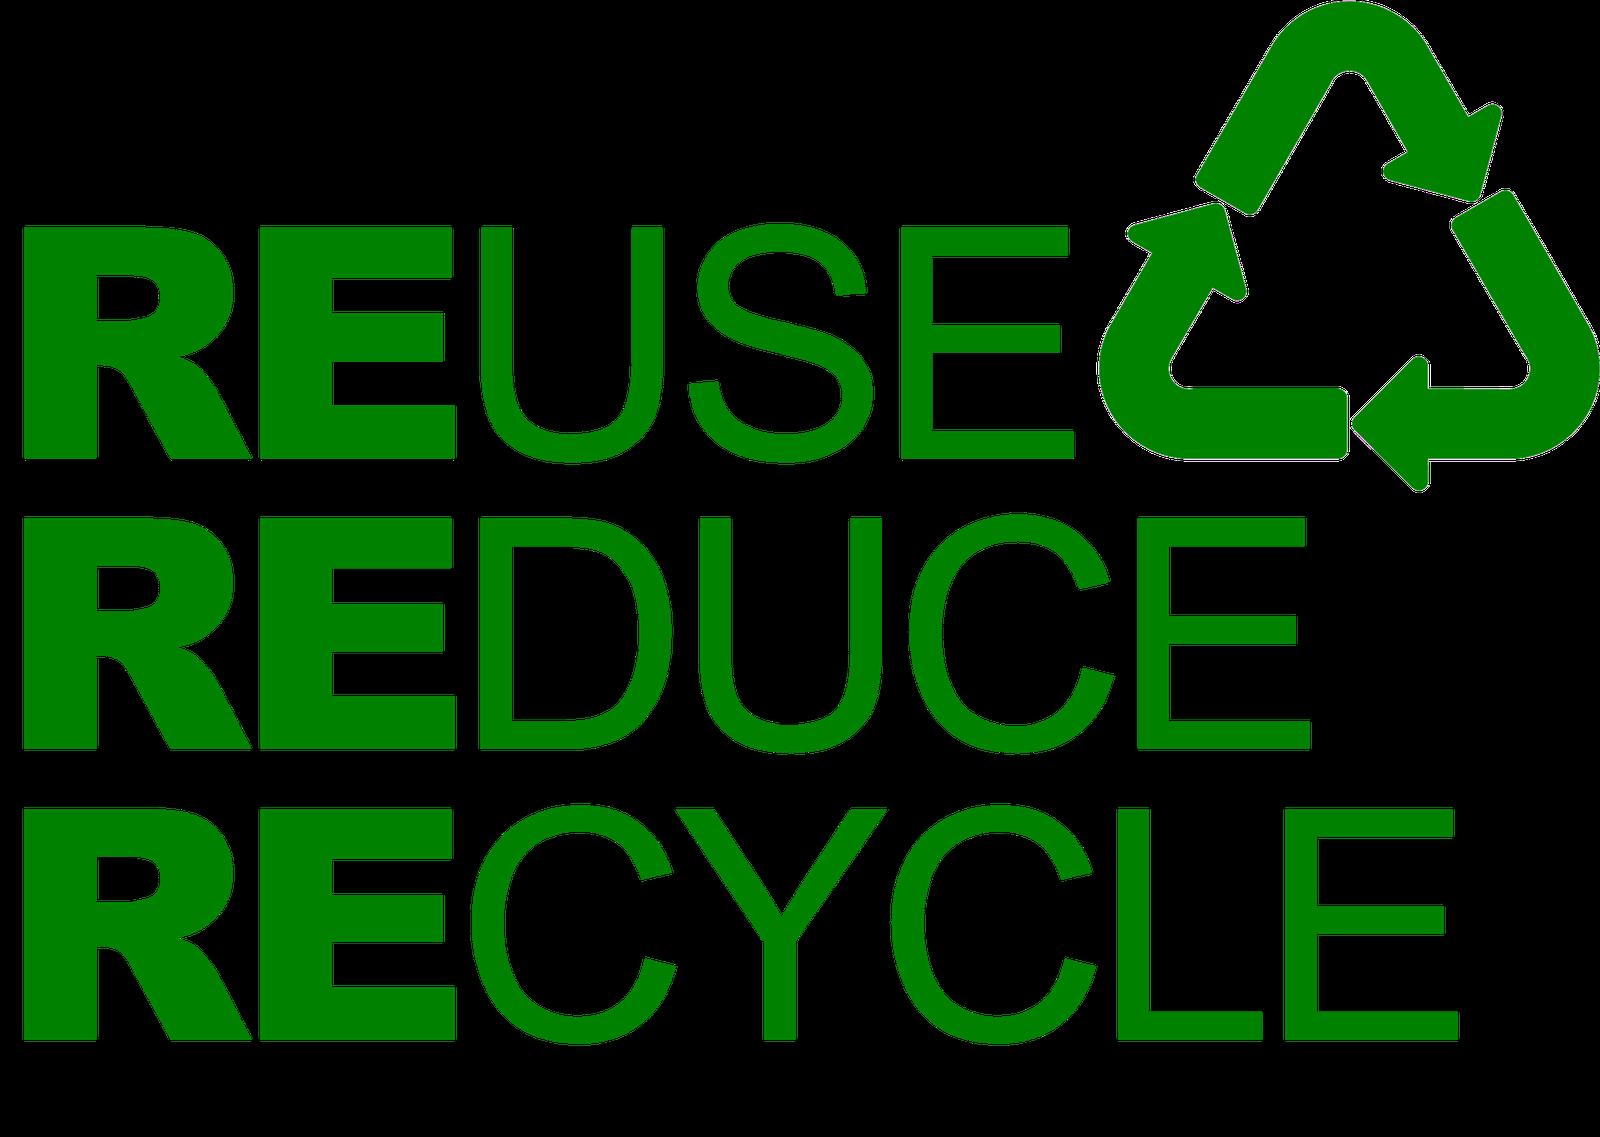 Reduce Reuse Recycle Symbol Free Image